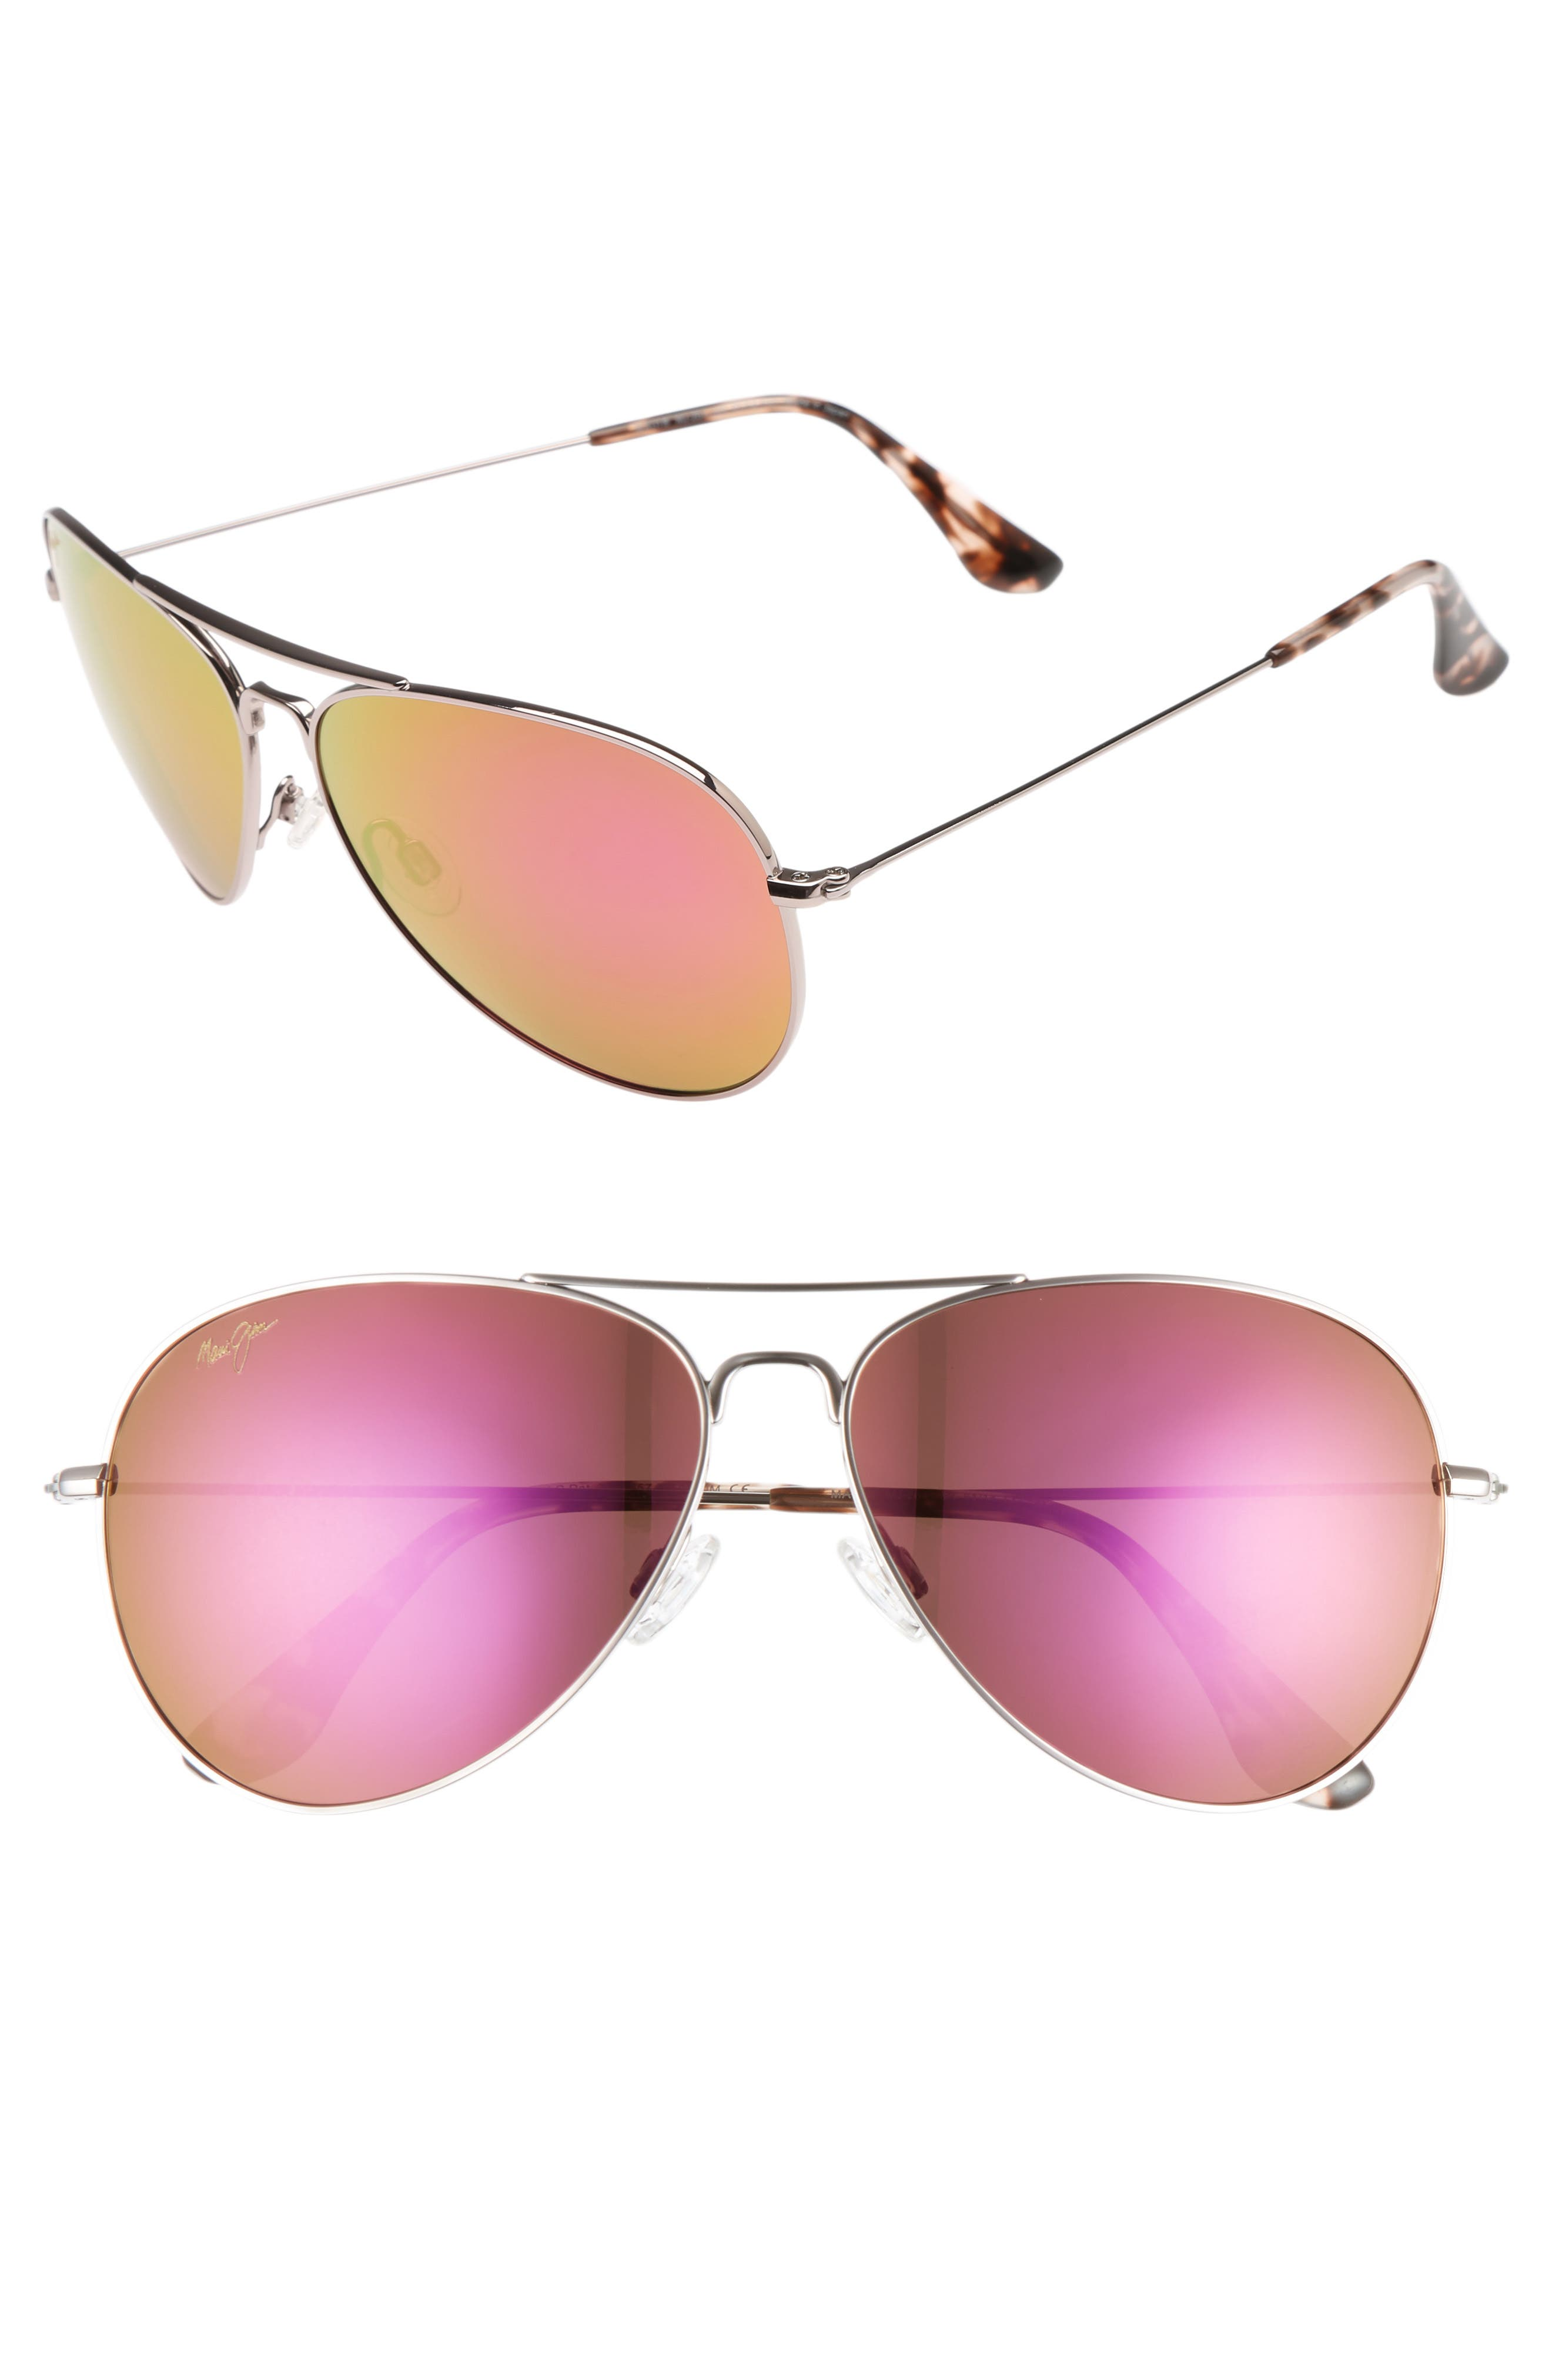 Main Image - Maui Jim Mavericks 61mm PolarizedPlus2® Aviator Sunglasses